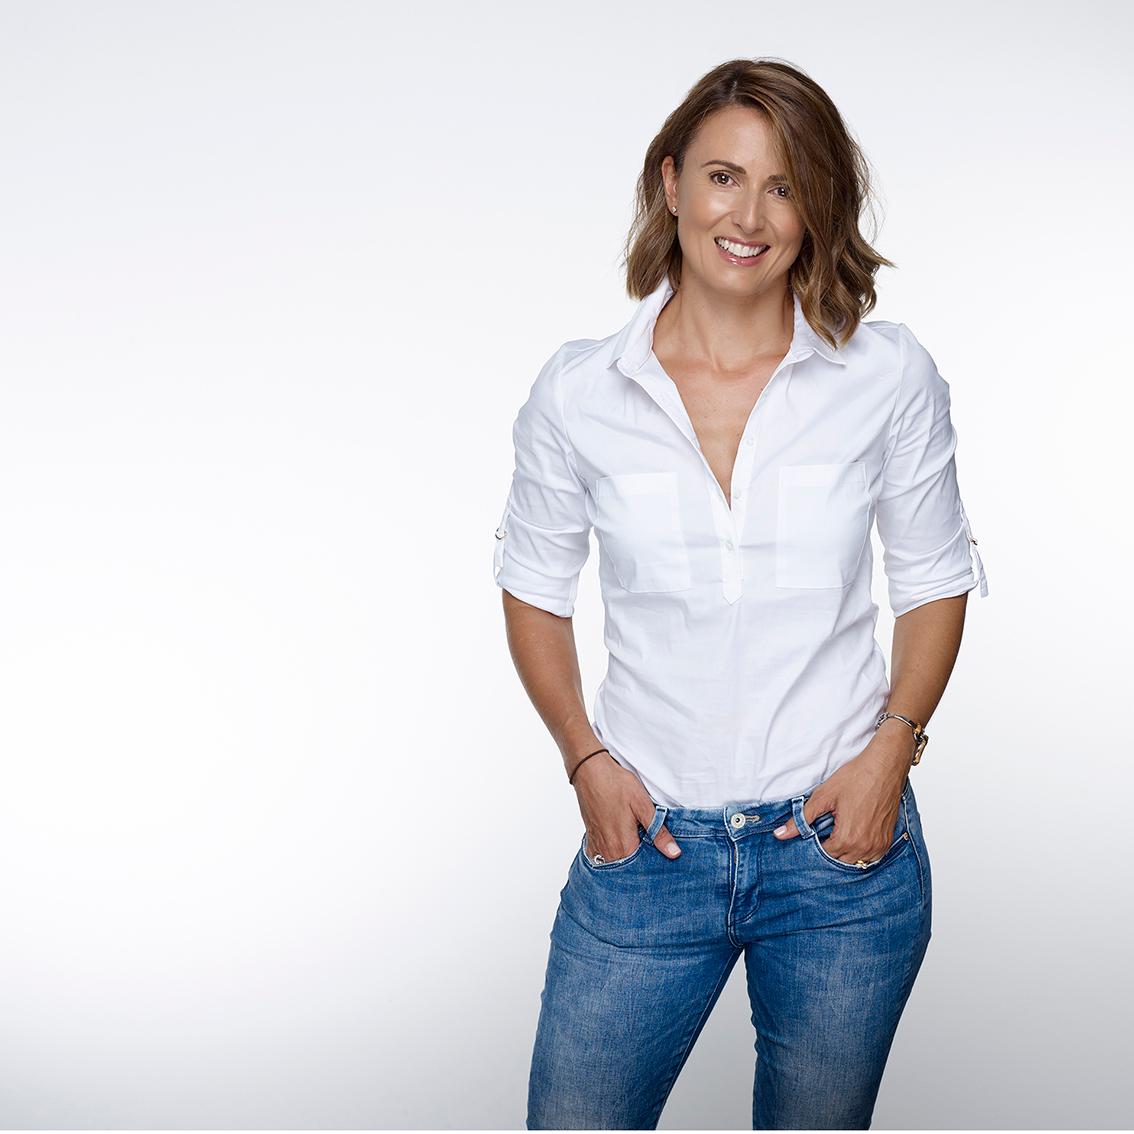 Olga Naumovski - Wellness Ambassador